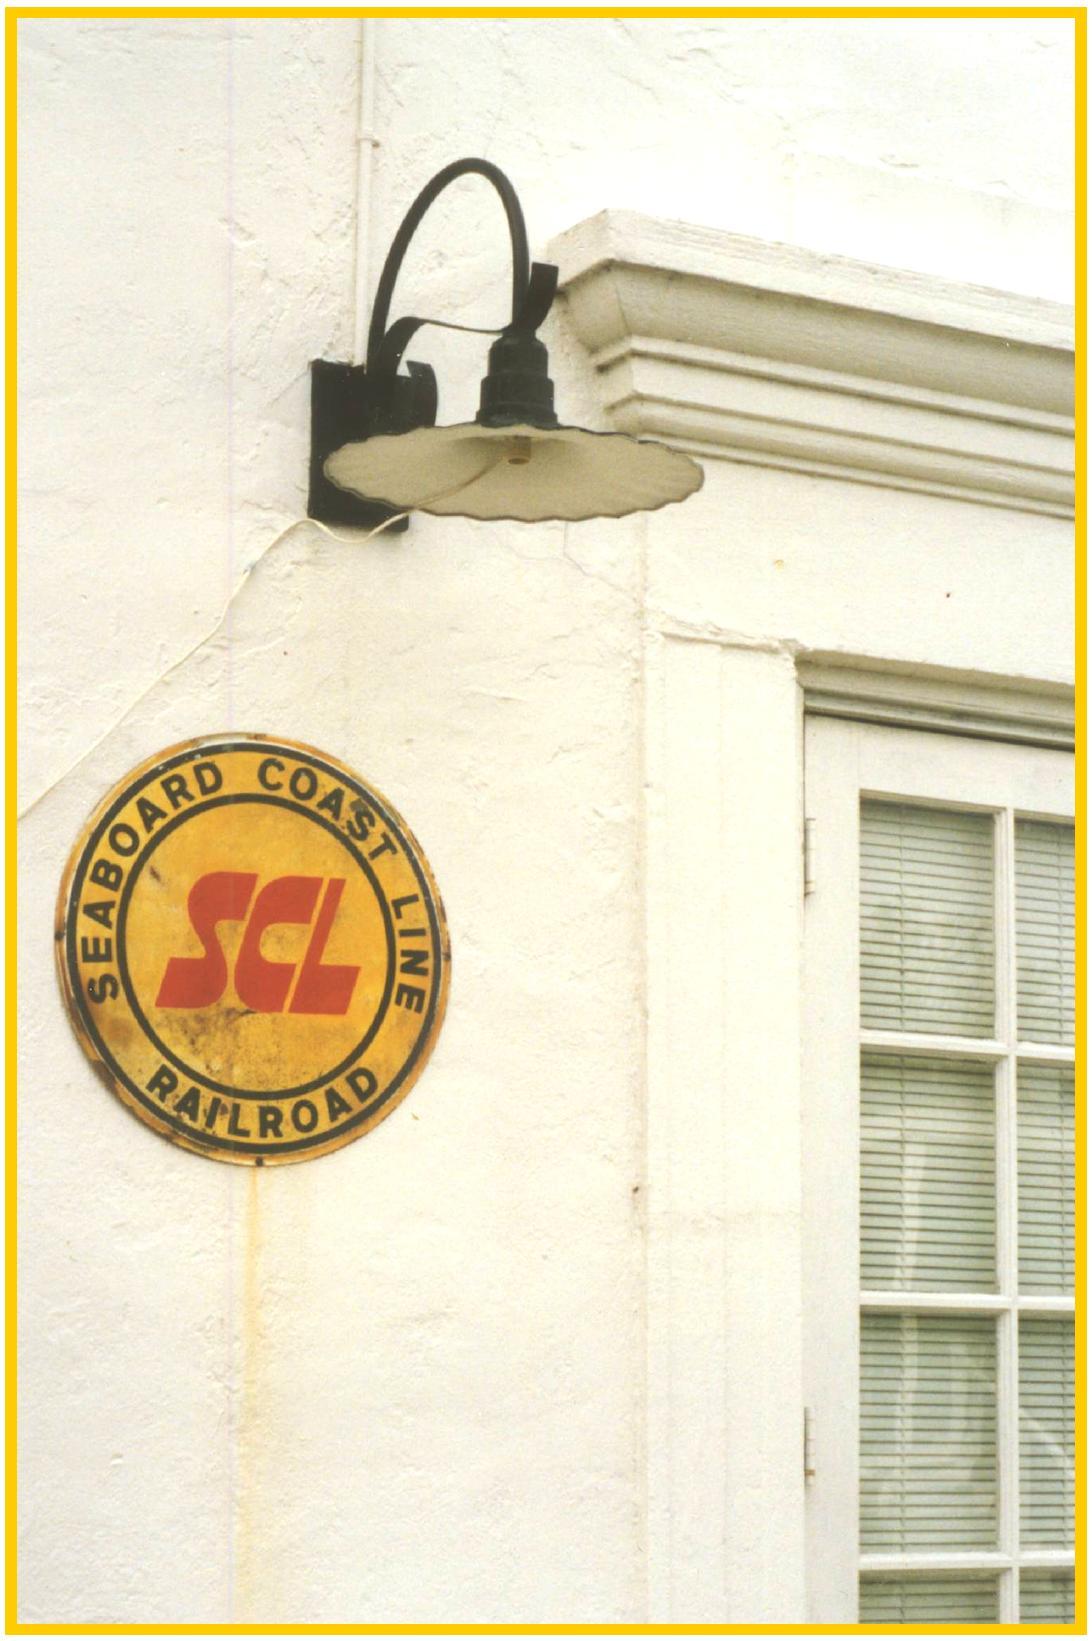 Historic Naples Depot Logo and Lamp, Naples, Fla.